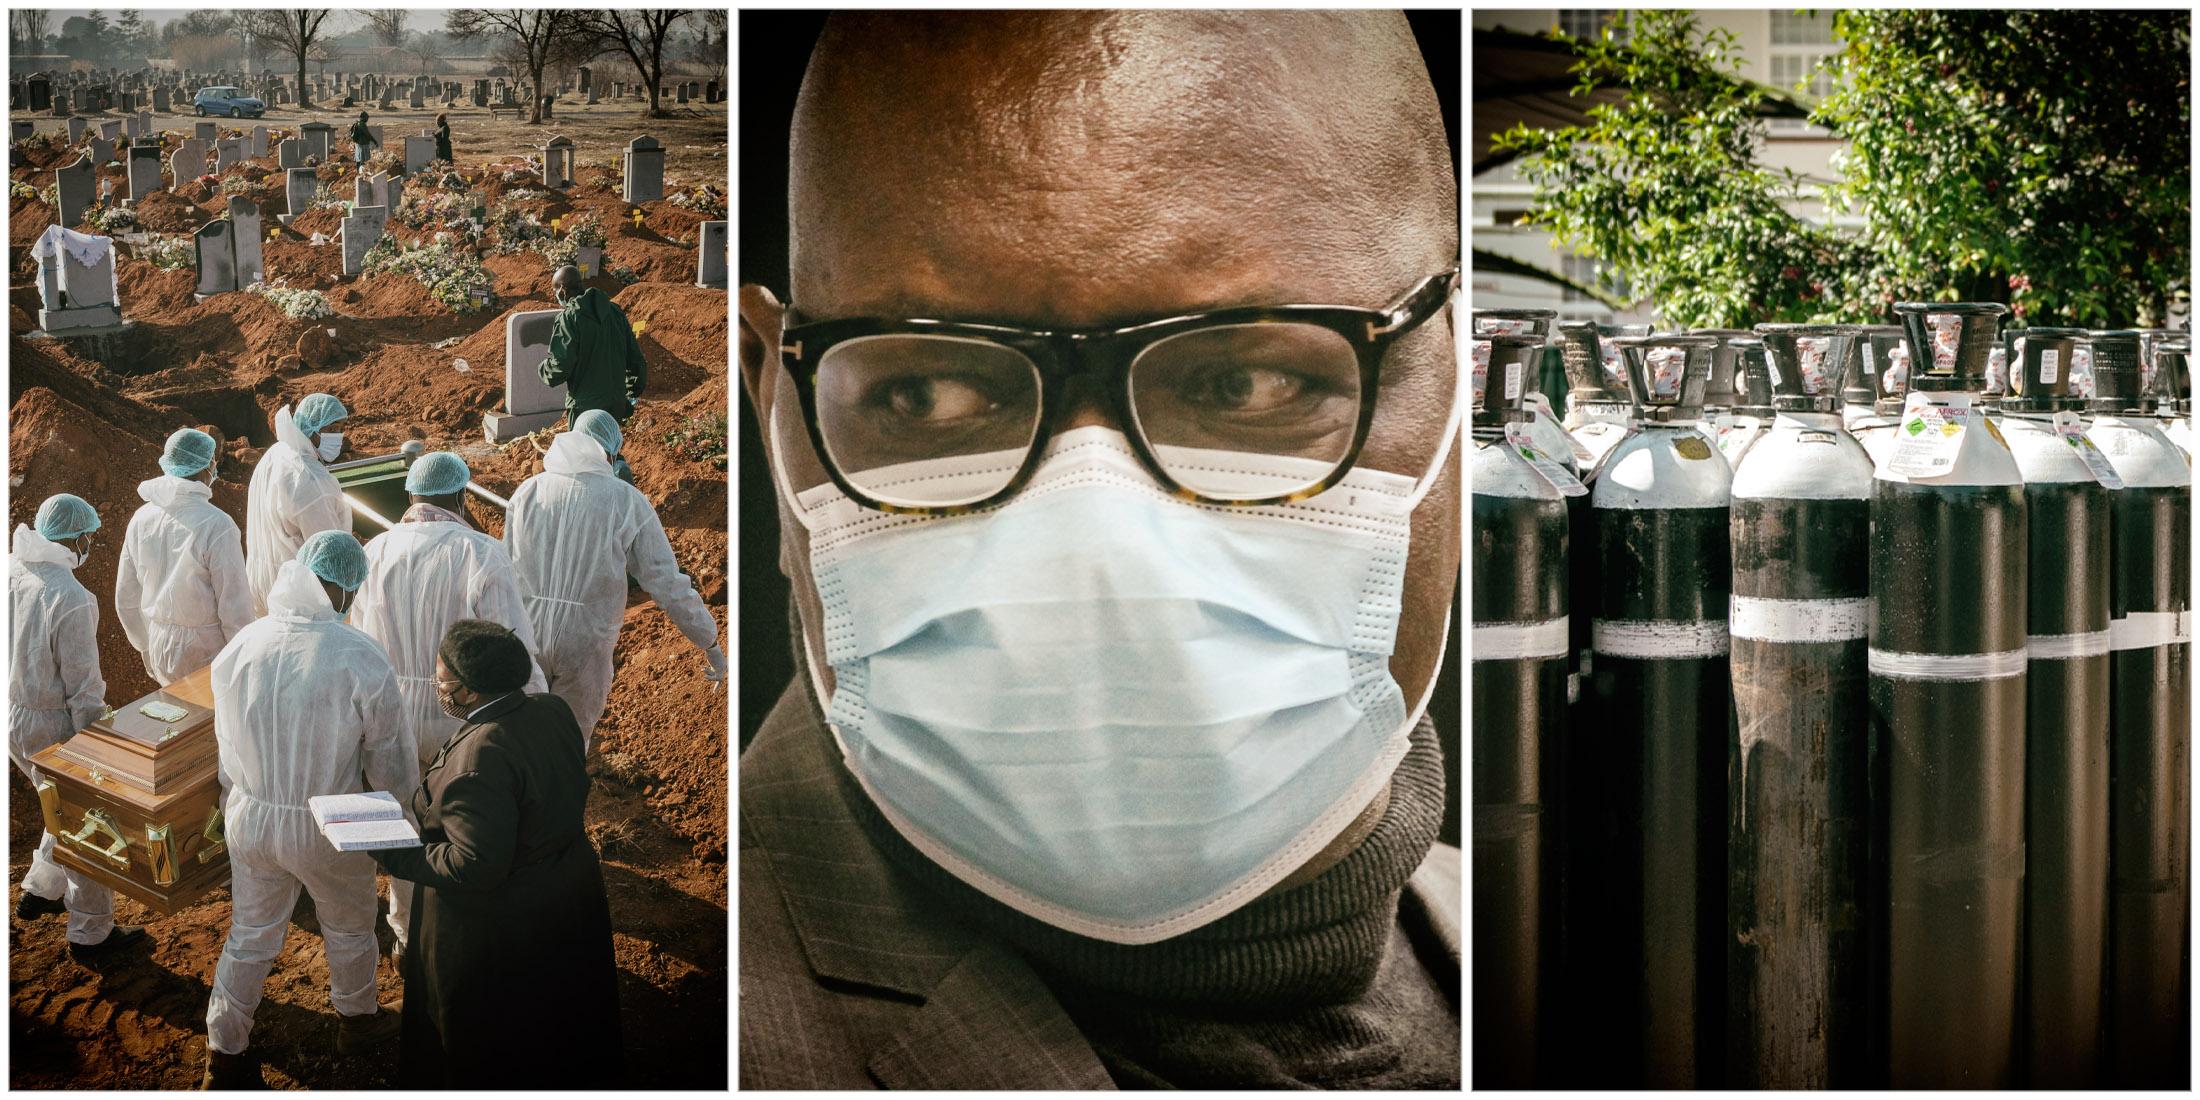 ANALYSIS: The third time around: Pandemic Horribilis tests Gauteng and David Makhura like never before